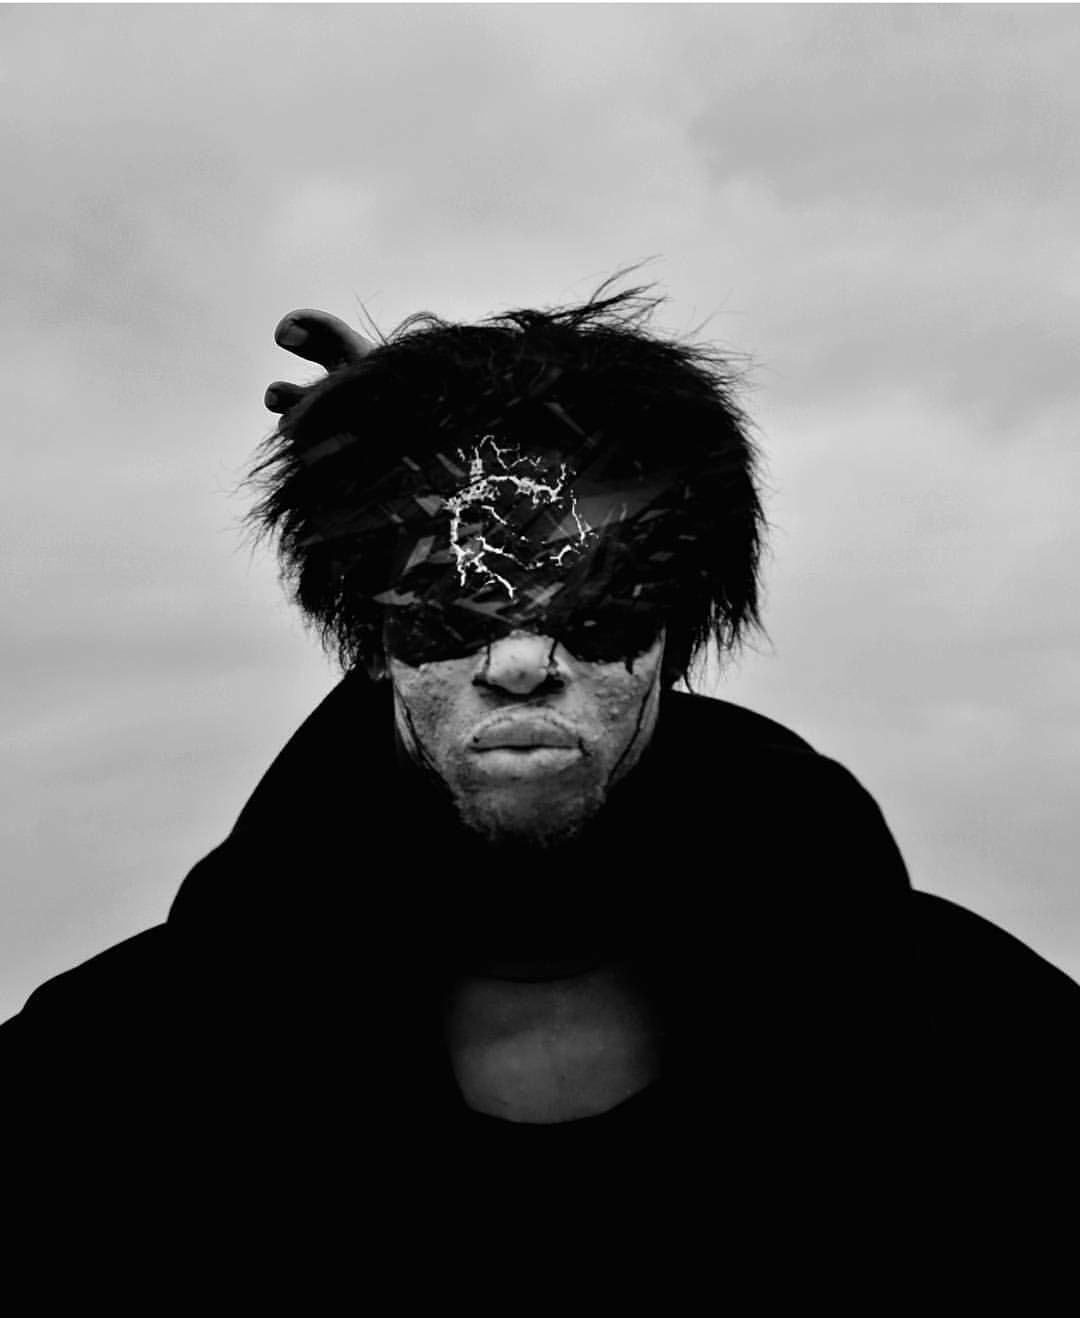 Dark Brave Intense...  @_187_photography  ______ #Osengwa | #AfricanArt | #AfricanFashion | #AfricanMusic | #AfricanStyle | #AfricanPhotography | #Afrocentric | #Melanin | #African | #Art | #AfricanInspired | #InspiredByAfrica | #BlackIsBeautiful | #ContemporaryArt | #OutOfAfrica